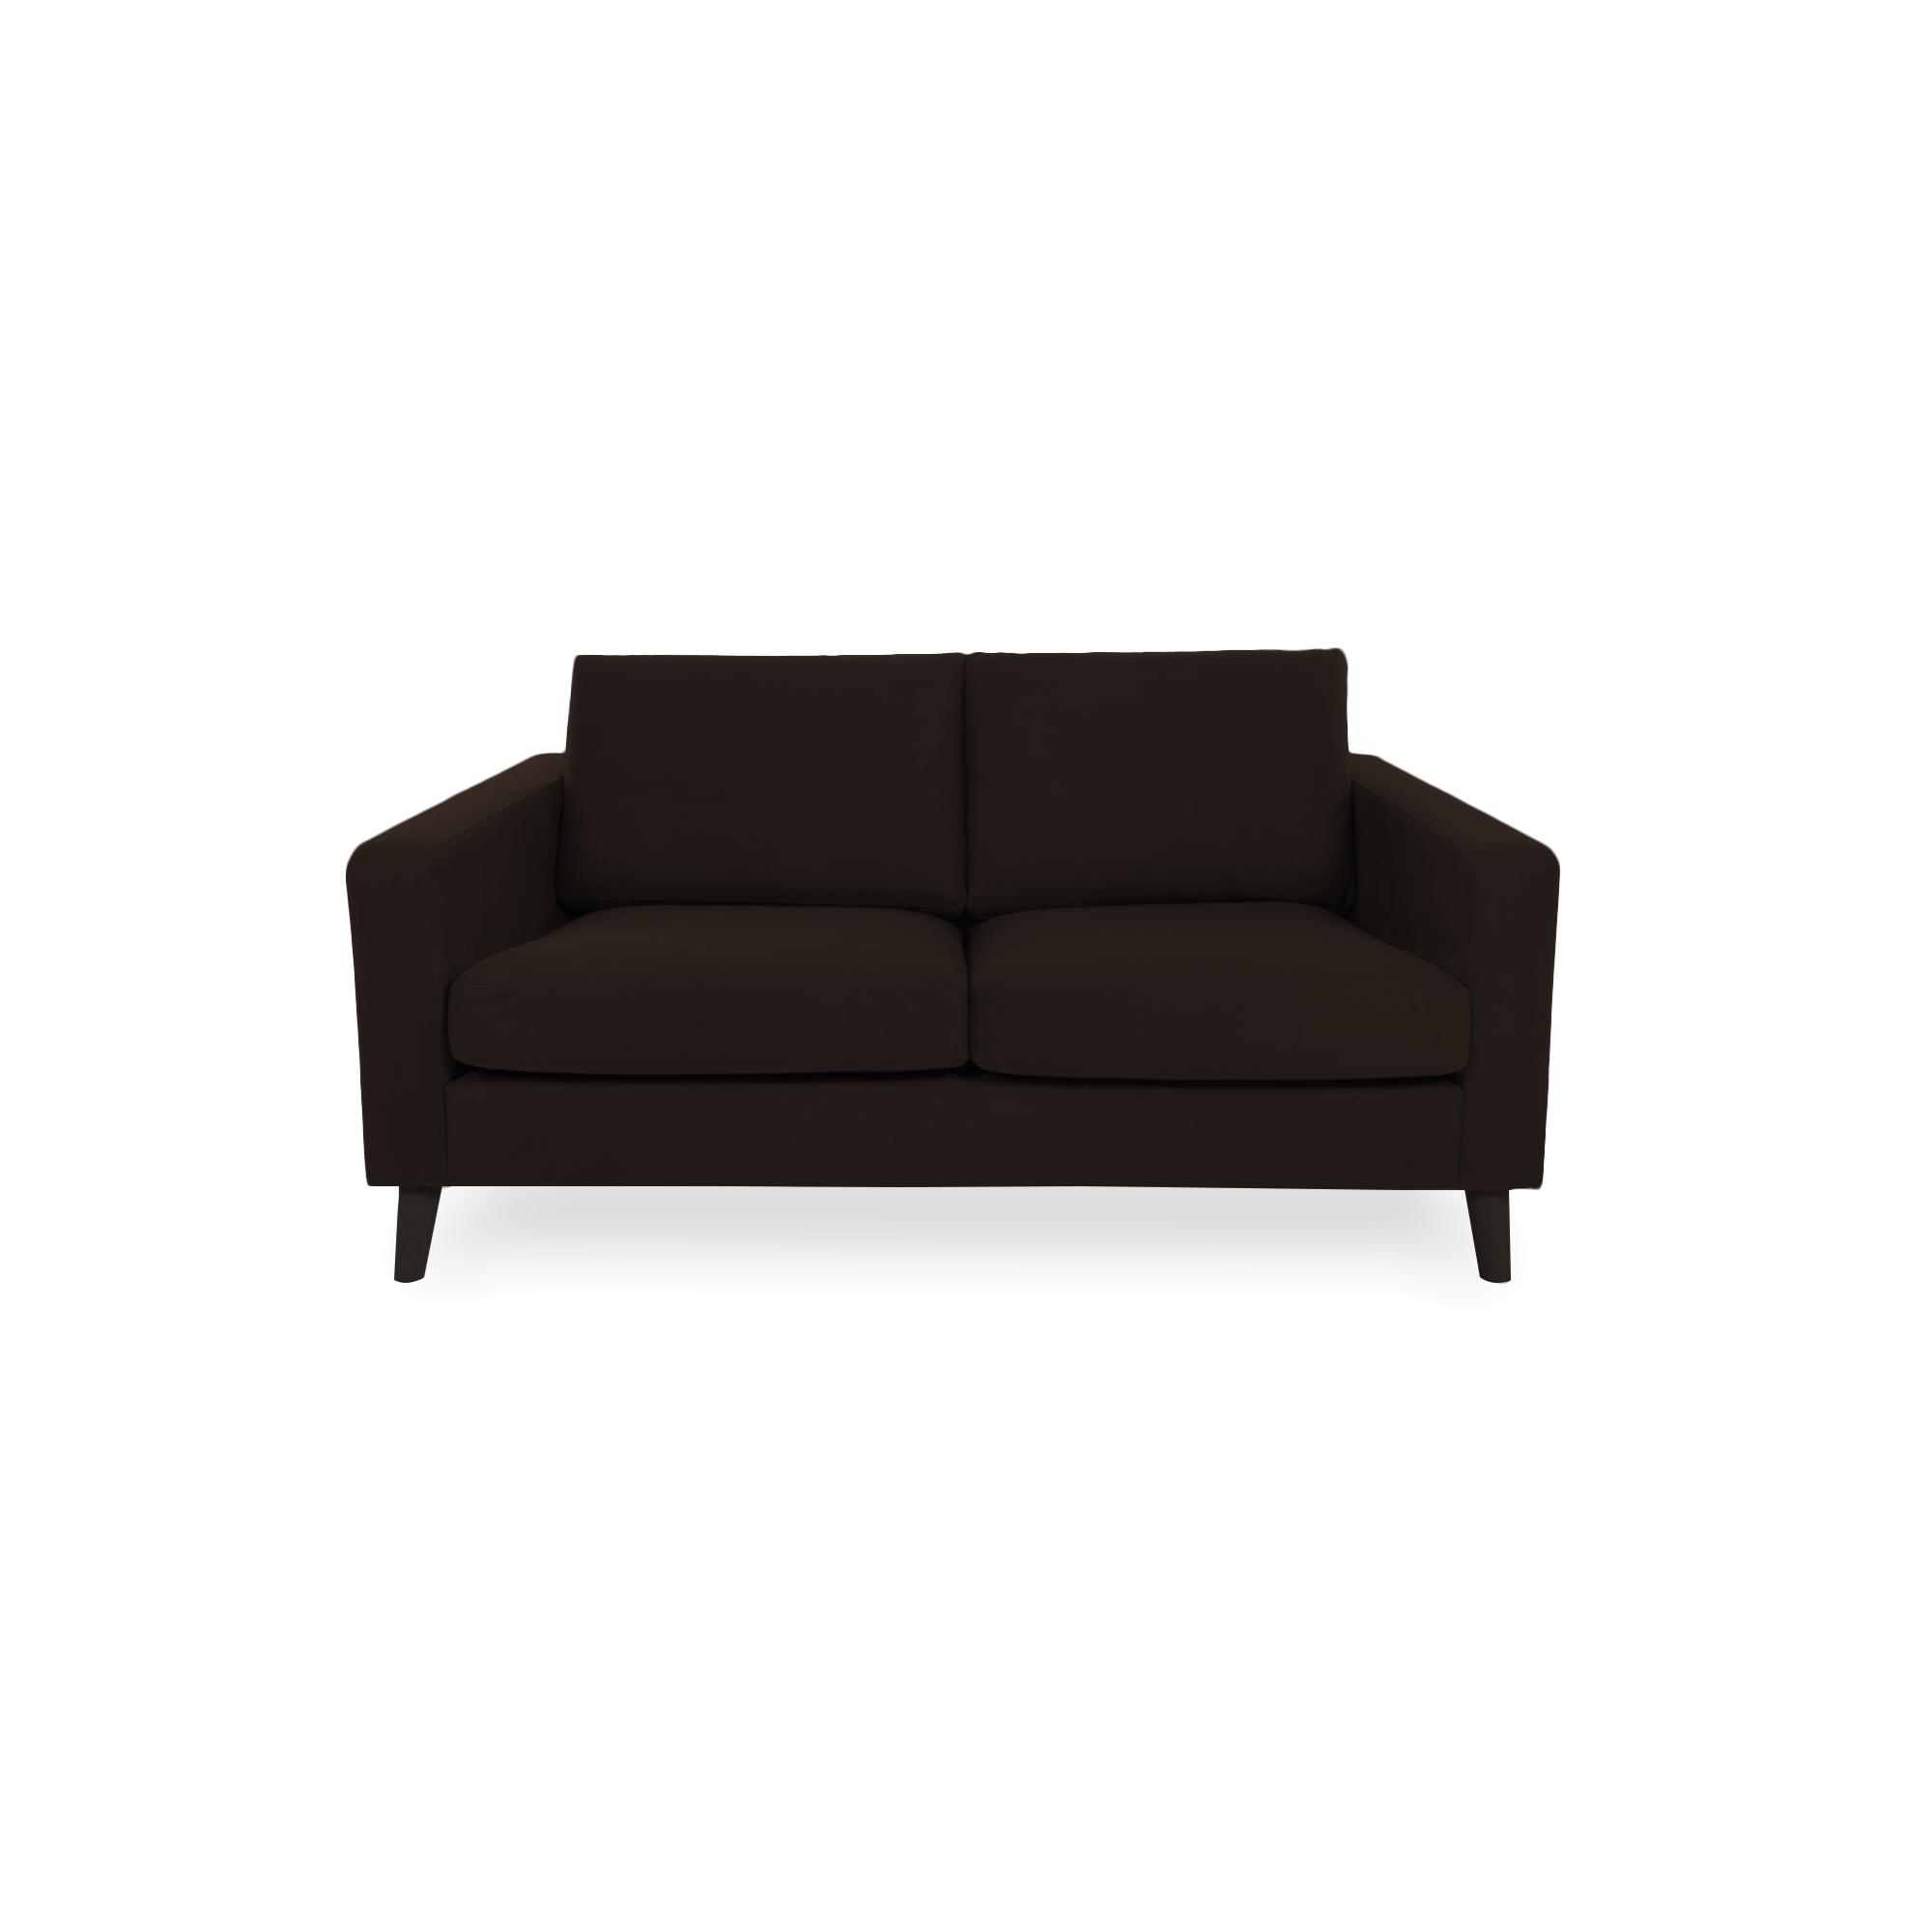 Canapea Fixa 2 locuri Tom Brown/Black